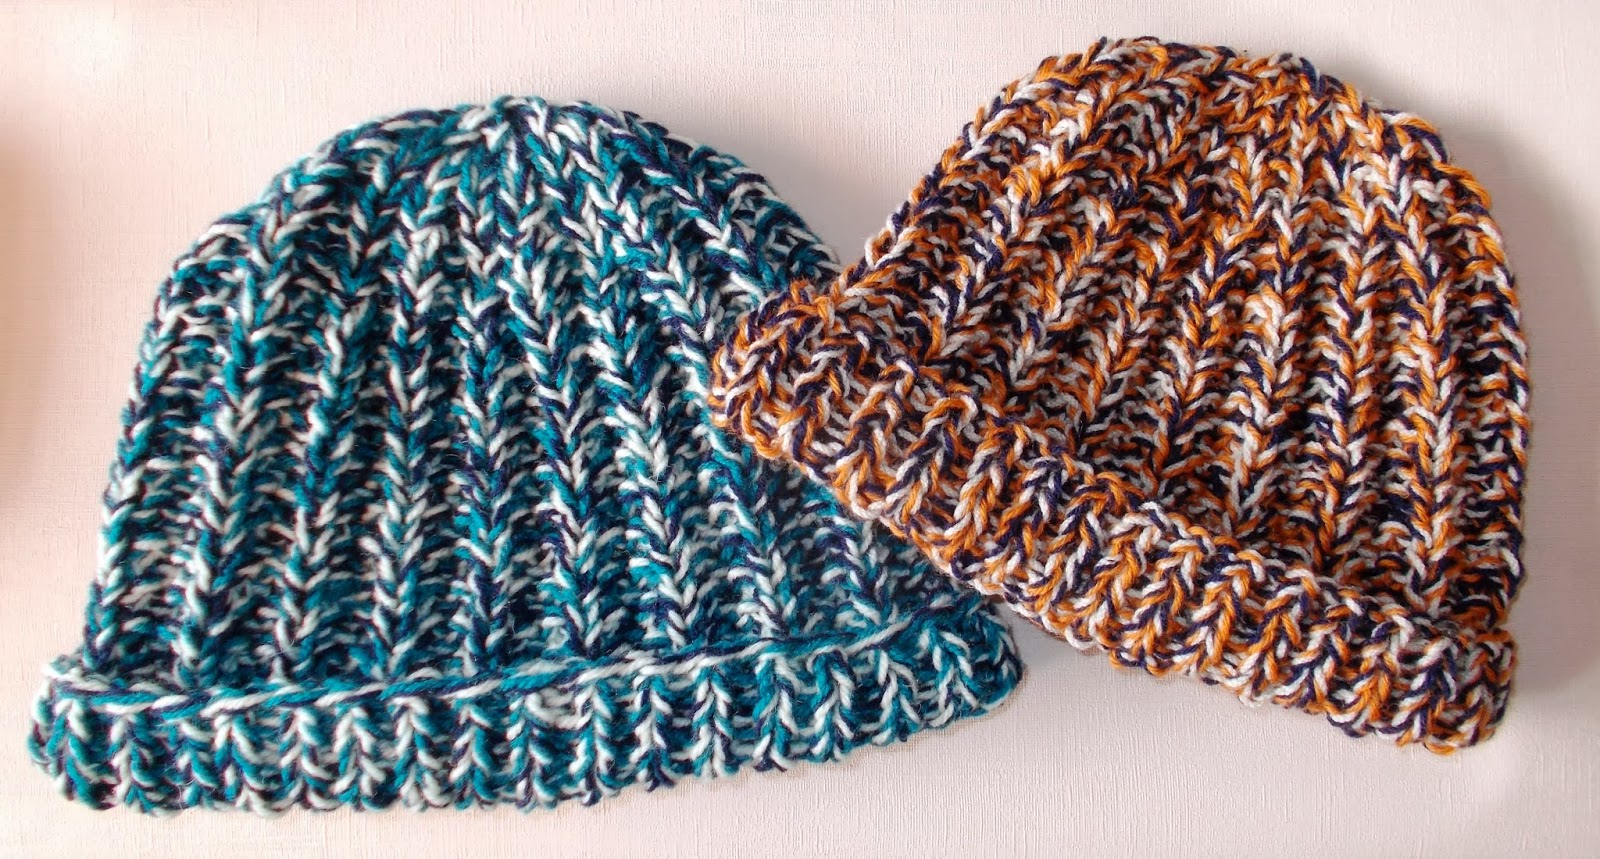 Marianna\'s Lazy Daisy Days: Warm Tweedy Adult Hats